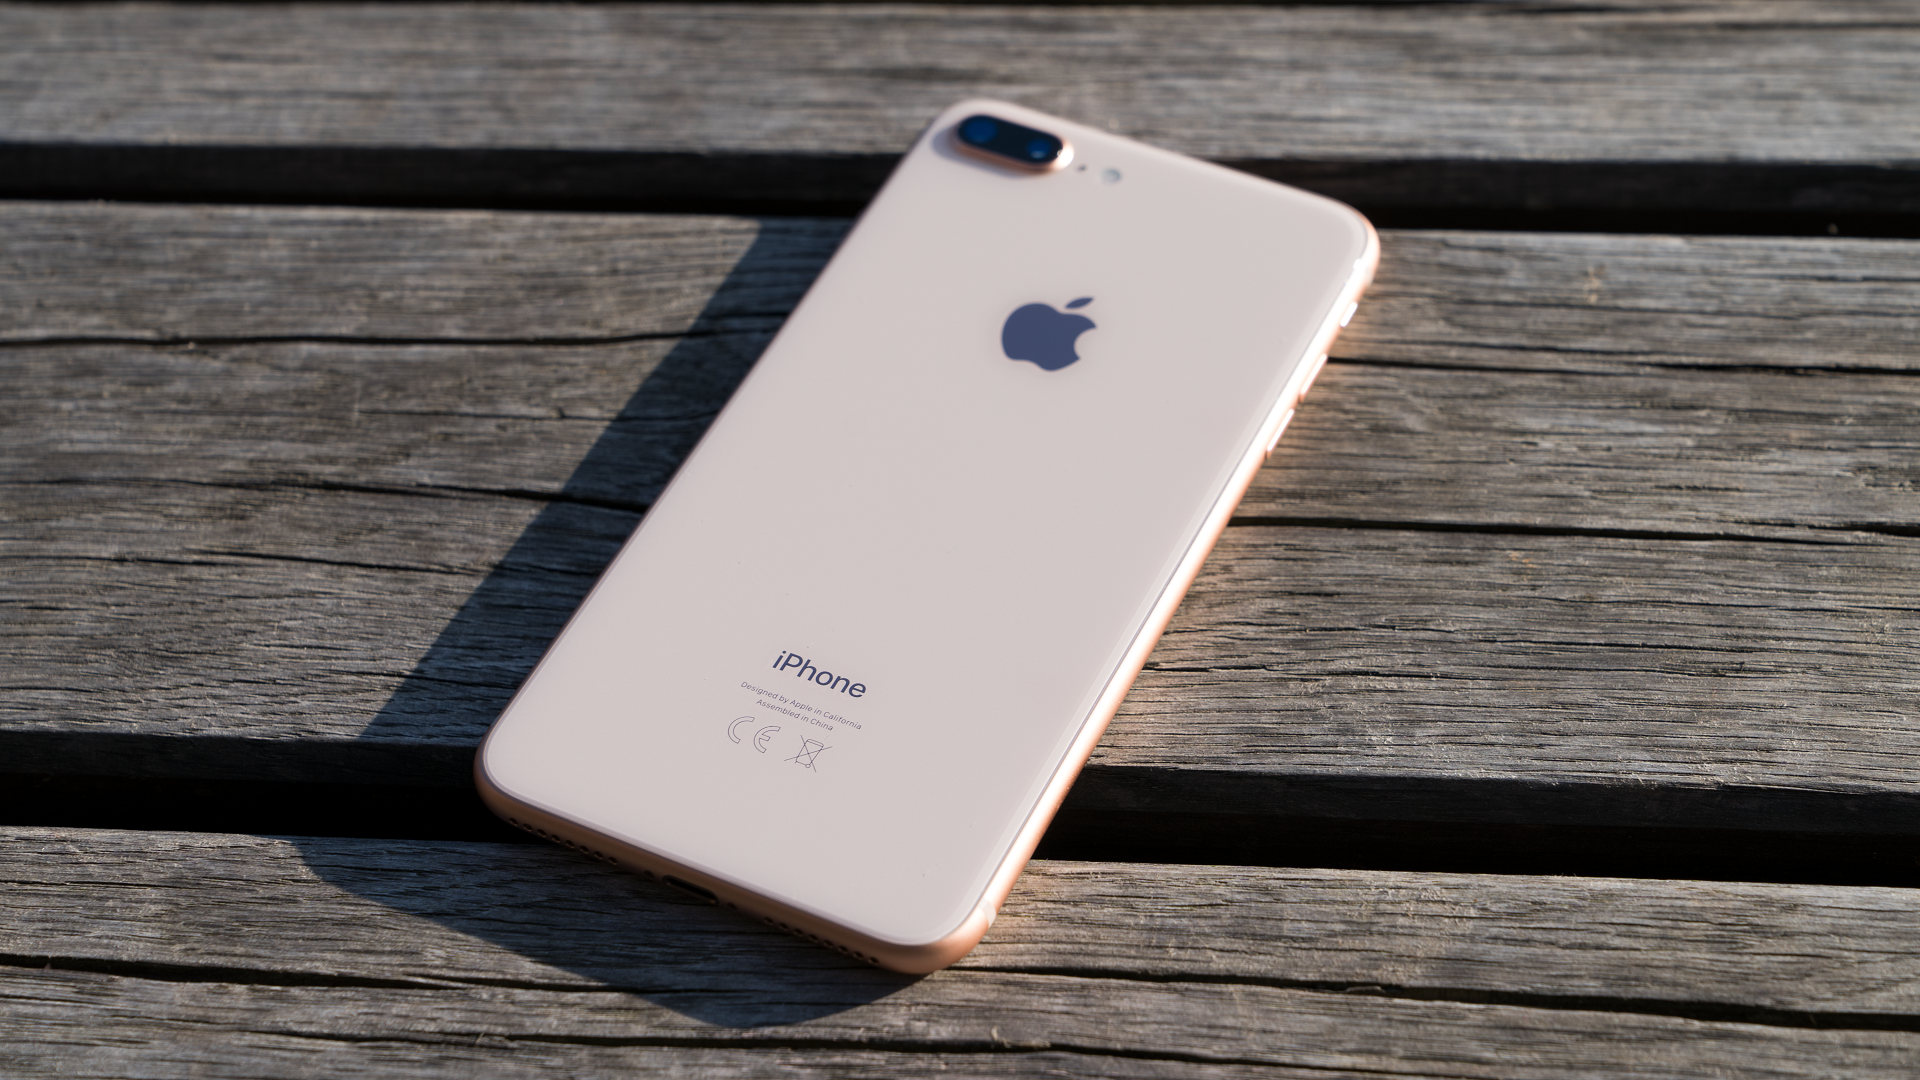 iPhone 9 Plus odhalen díky uniklému kódu iOS 14